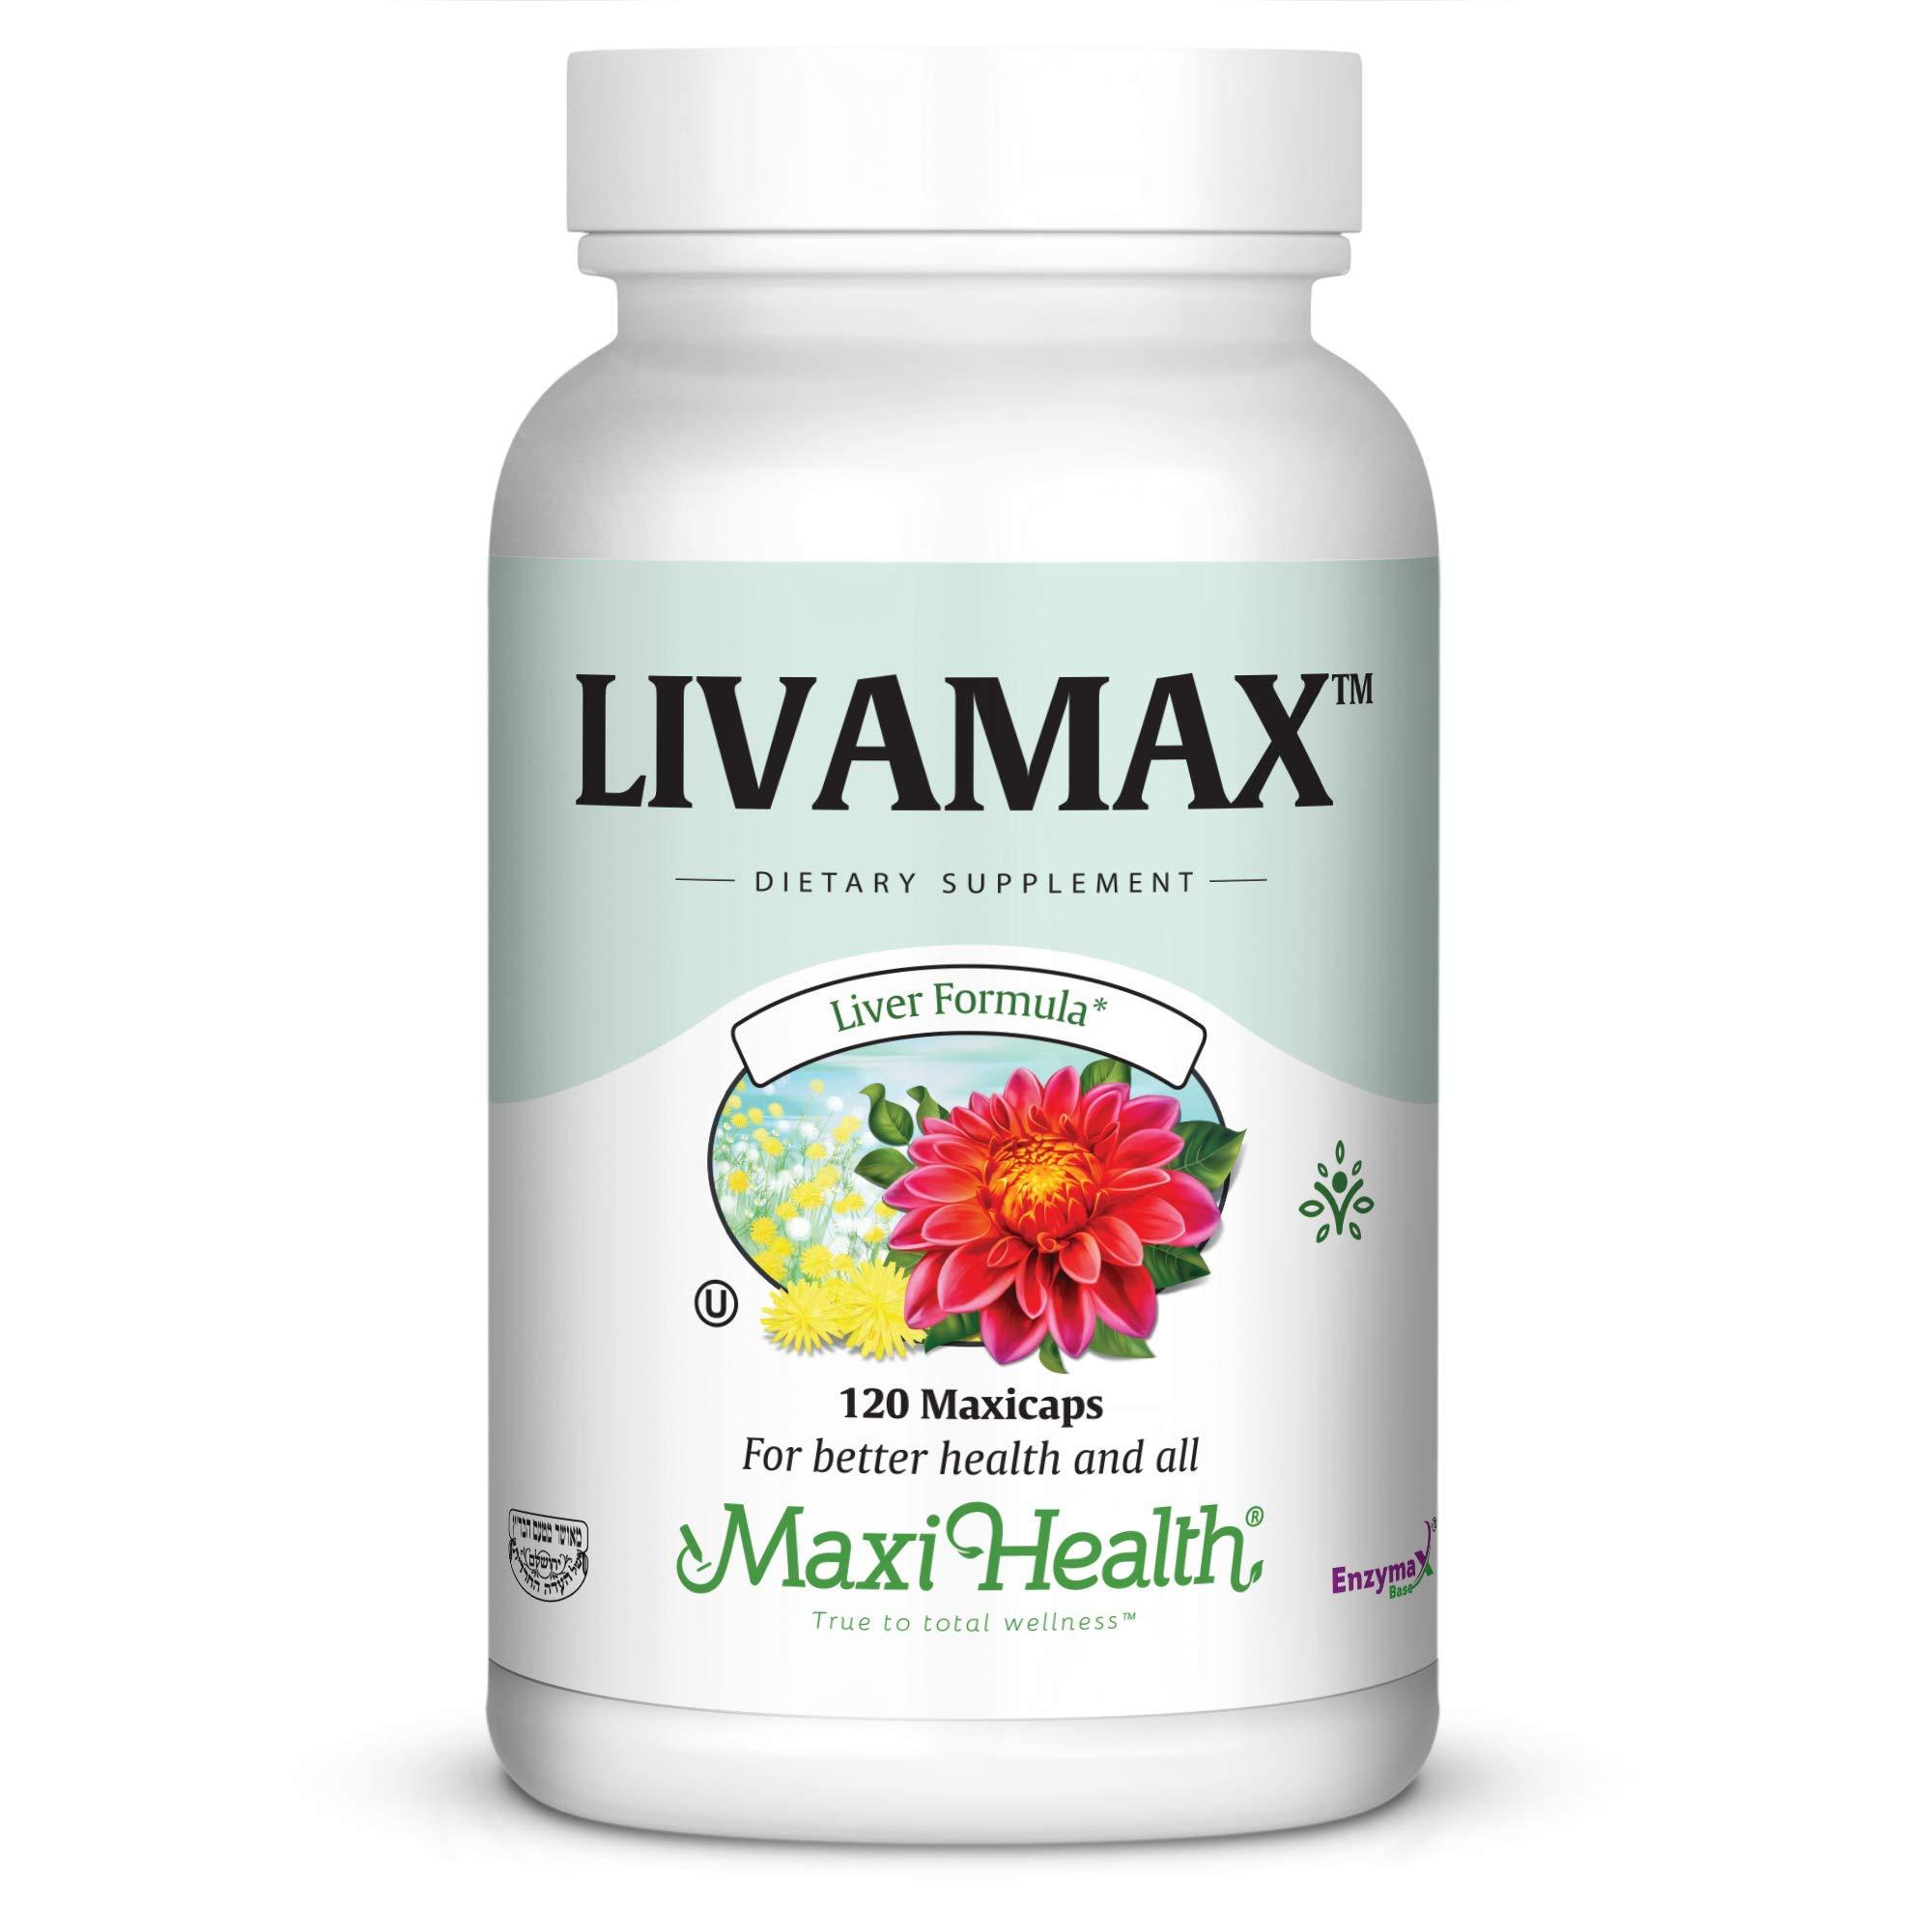 Maxi Health Livamax - Liver Formula - with Milk Thistle and Dandelion Root - 120 Capsules - Kosher